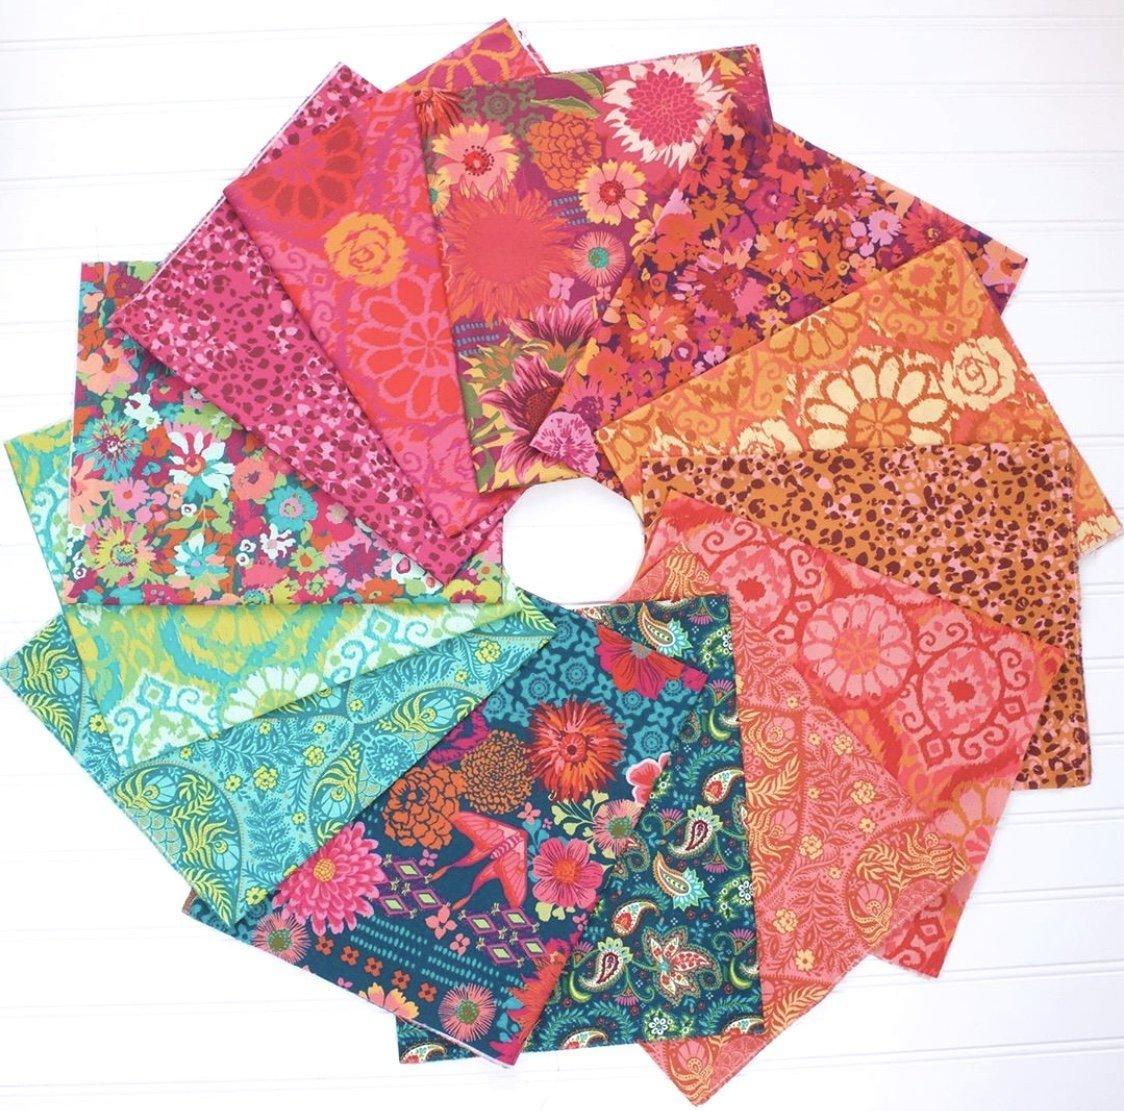 Kasada - Fat Quarter Bundle 13pc/bundle - By Crystal Manning For Moda Fabrics